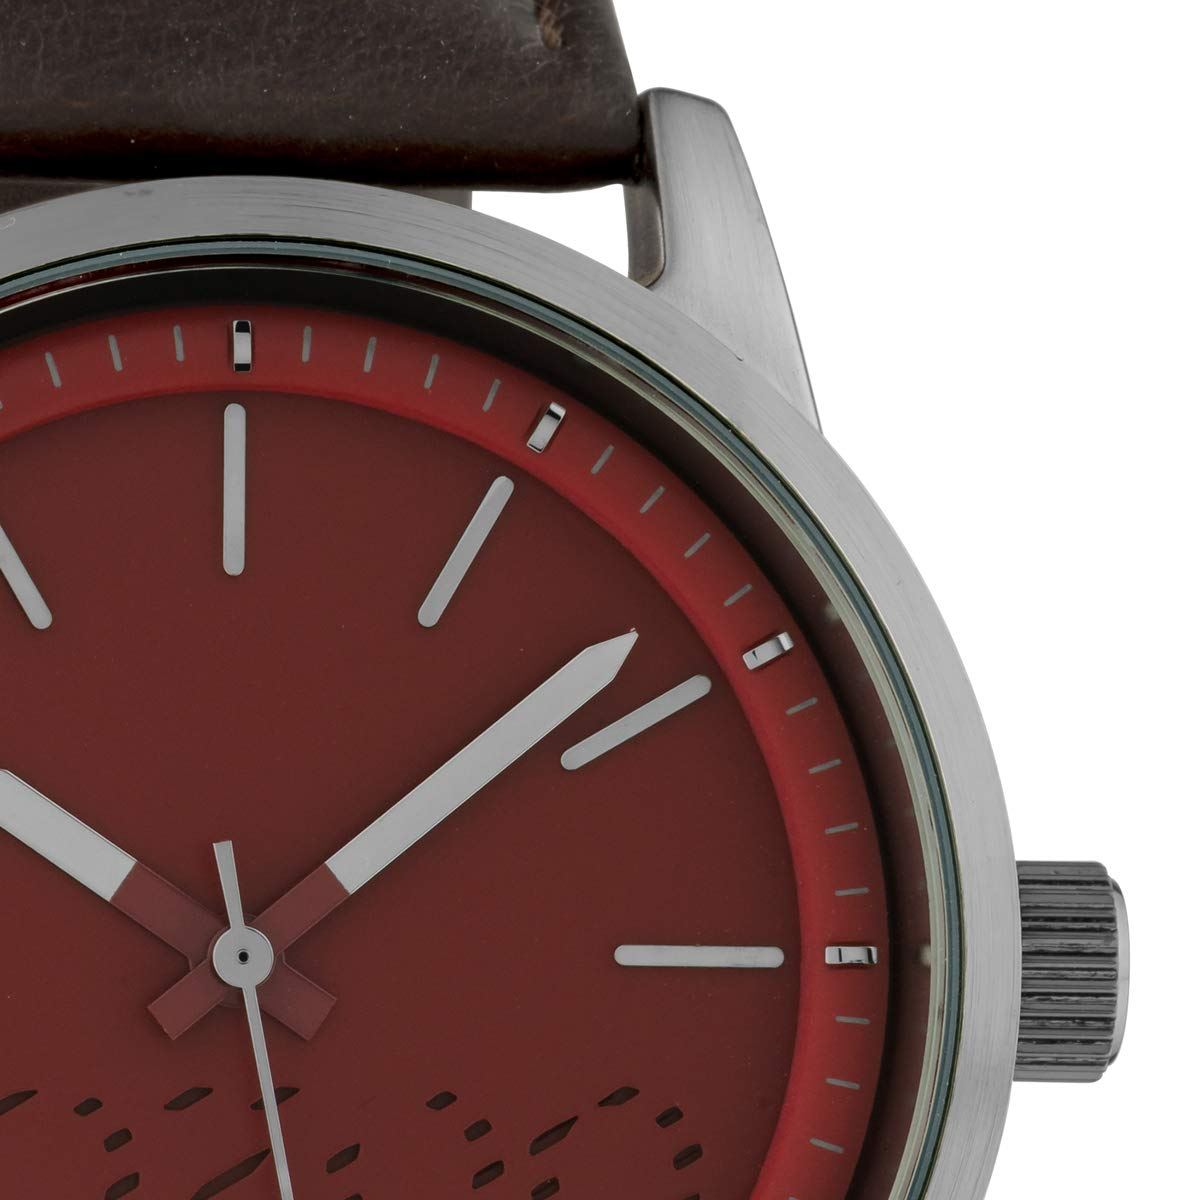 Oozoo mode herrklocka med läderrem kvarts klassisk 43 mm Vinröd/mörkbrun